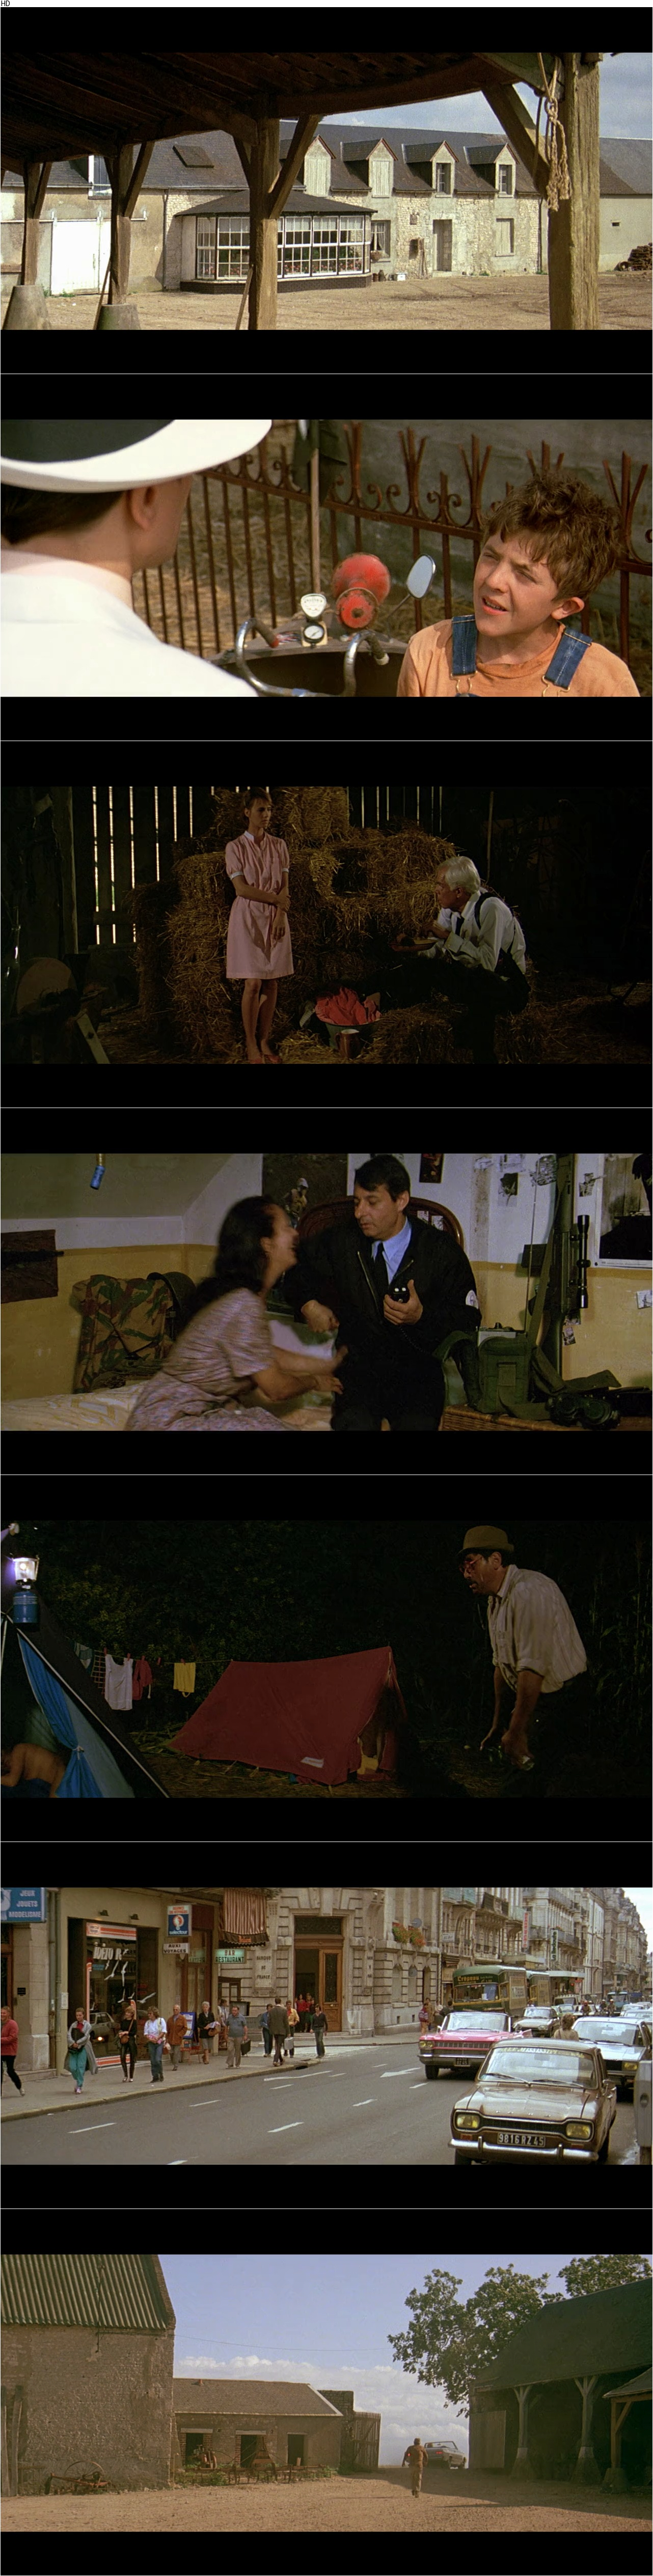 Dog Day (1984) Canicule